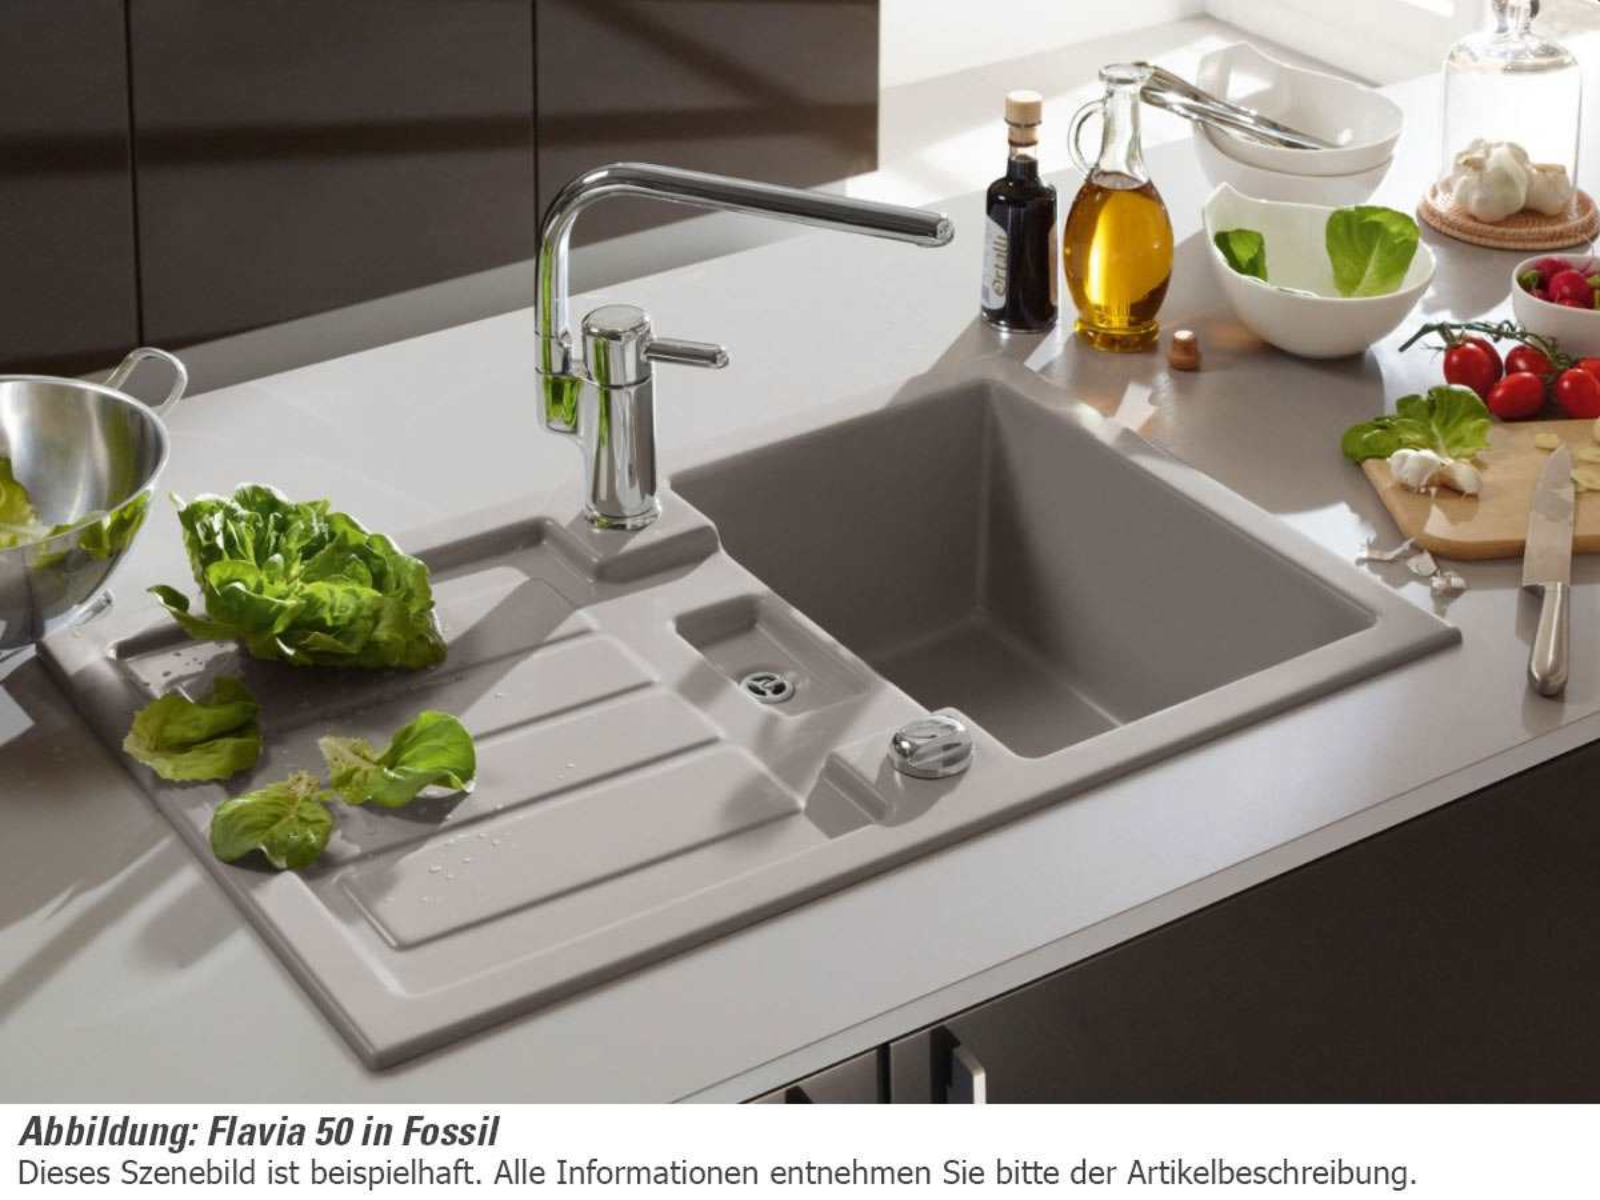 Villeroy & Boch Flavia 50 Snow White - 3305 02 KG Keramikspüle Exzenterbetätigung